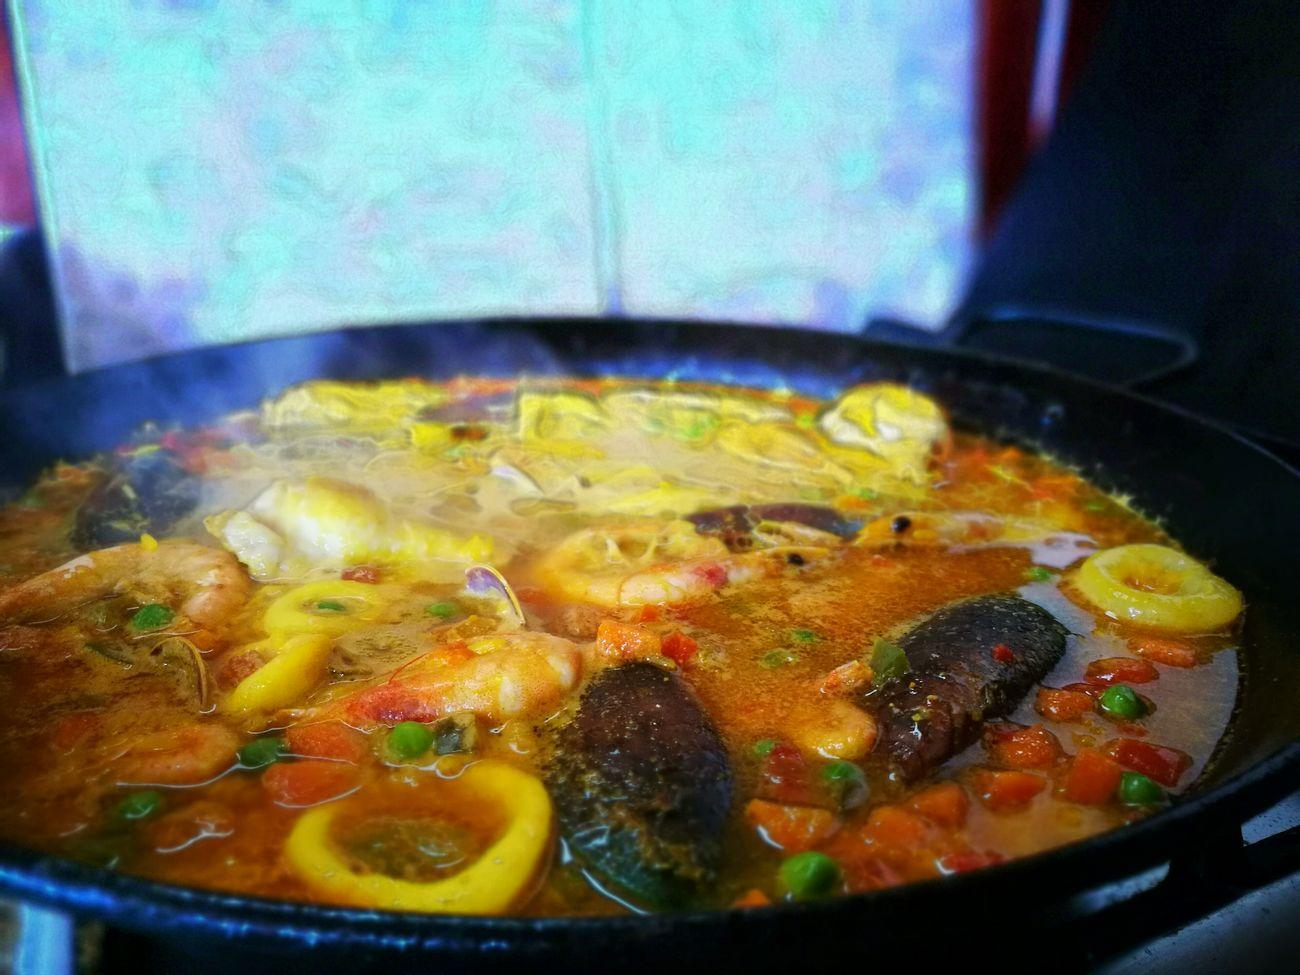 Paella Marisco Pollo Spanish Food Heat - Temperature Food Freshness Ready-to-eat HuaweiP9 Seafood Vegetable Love Food, Love Life.